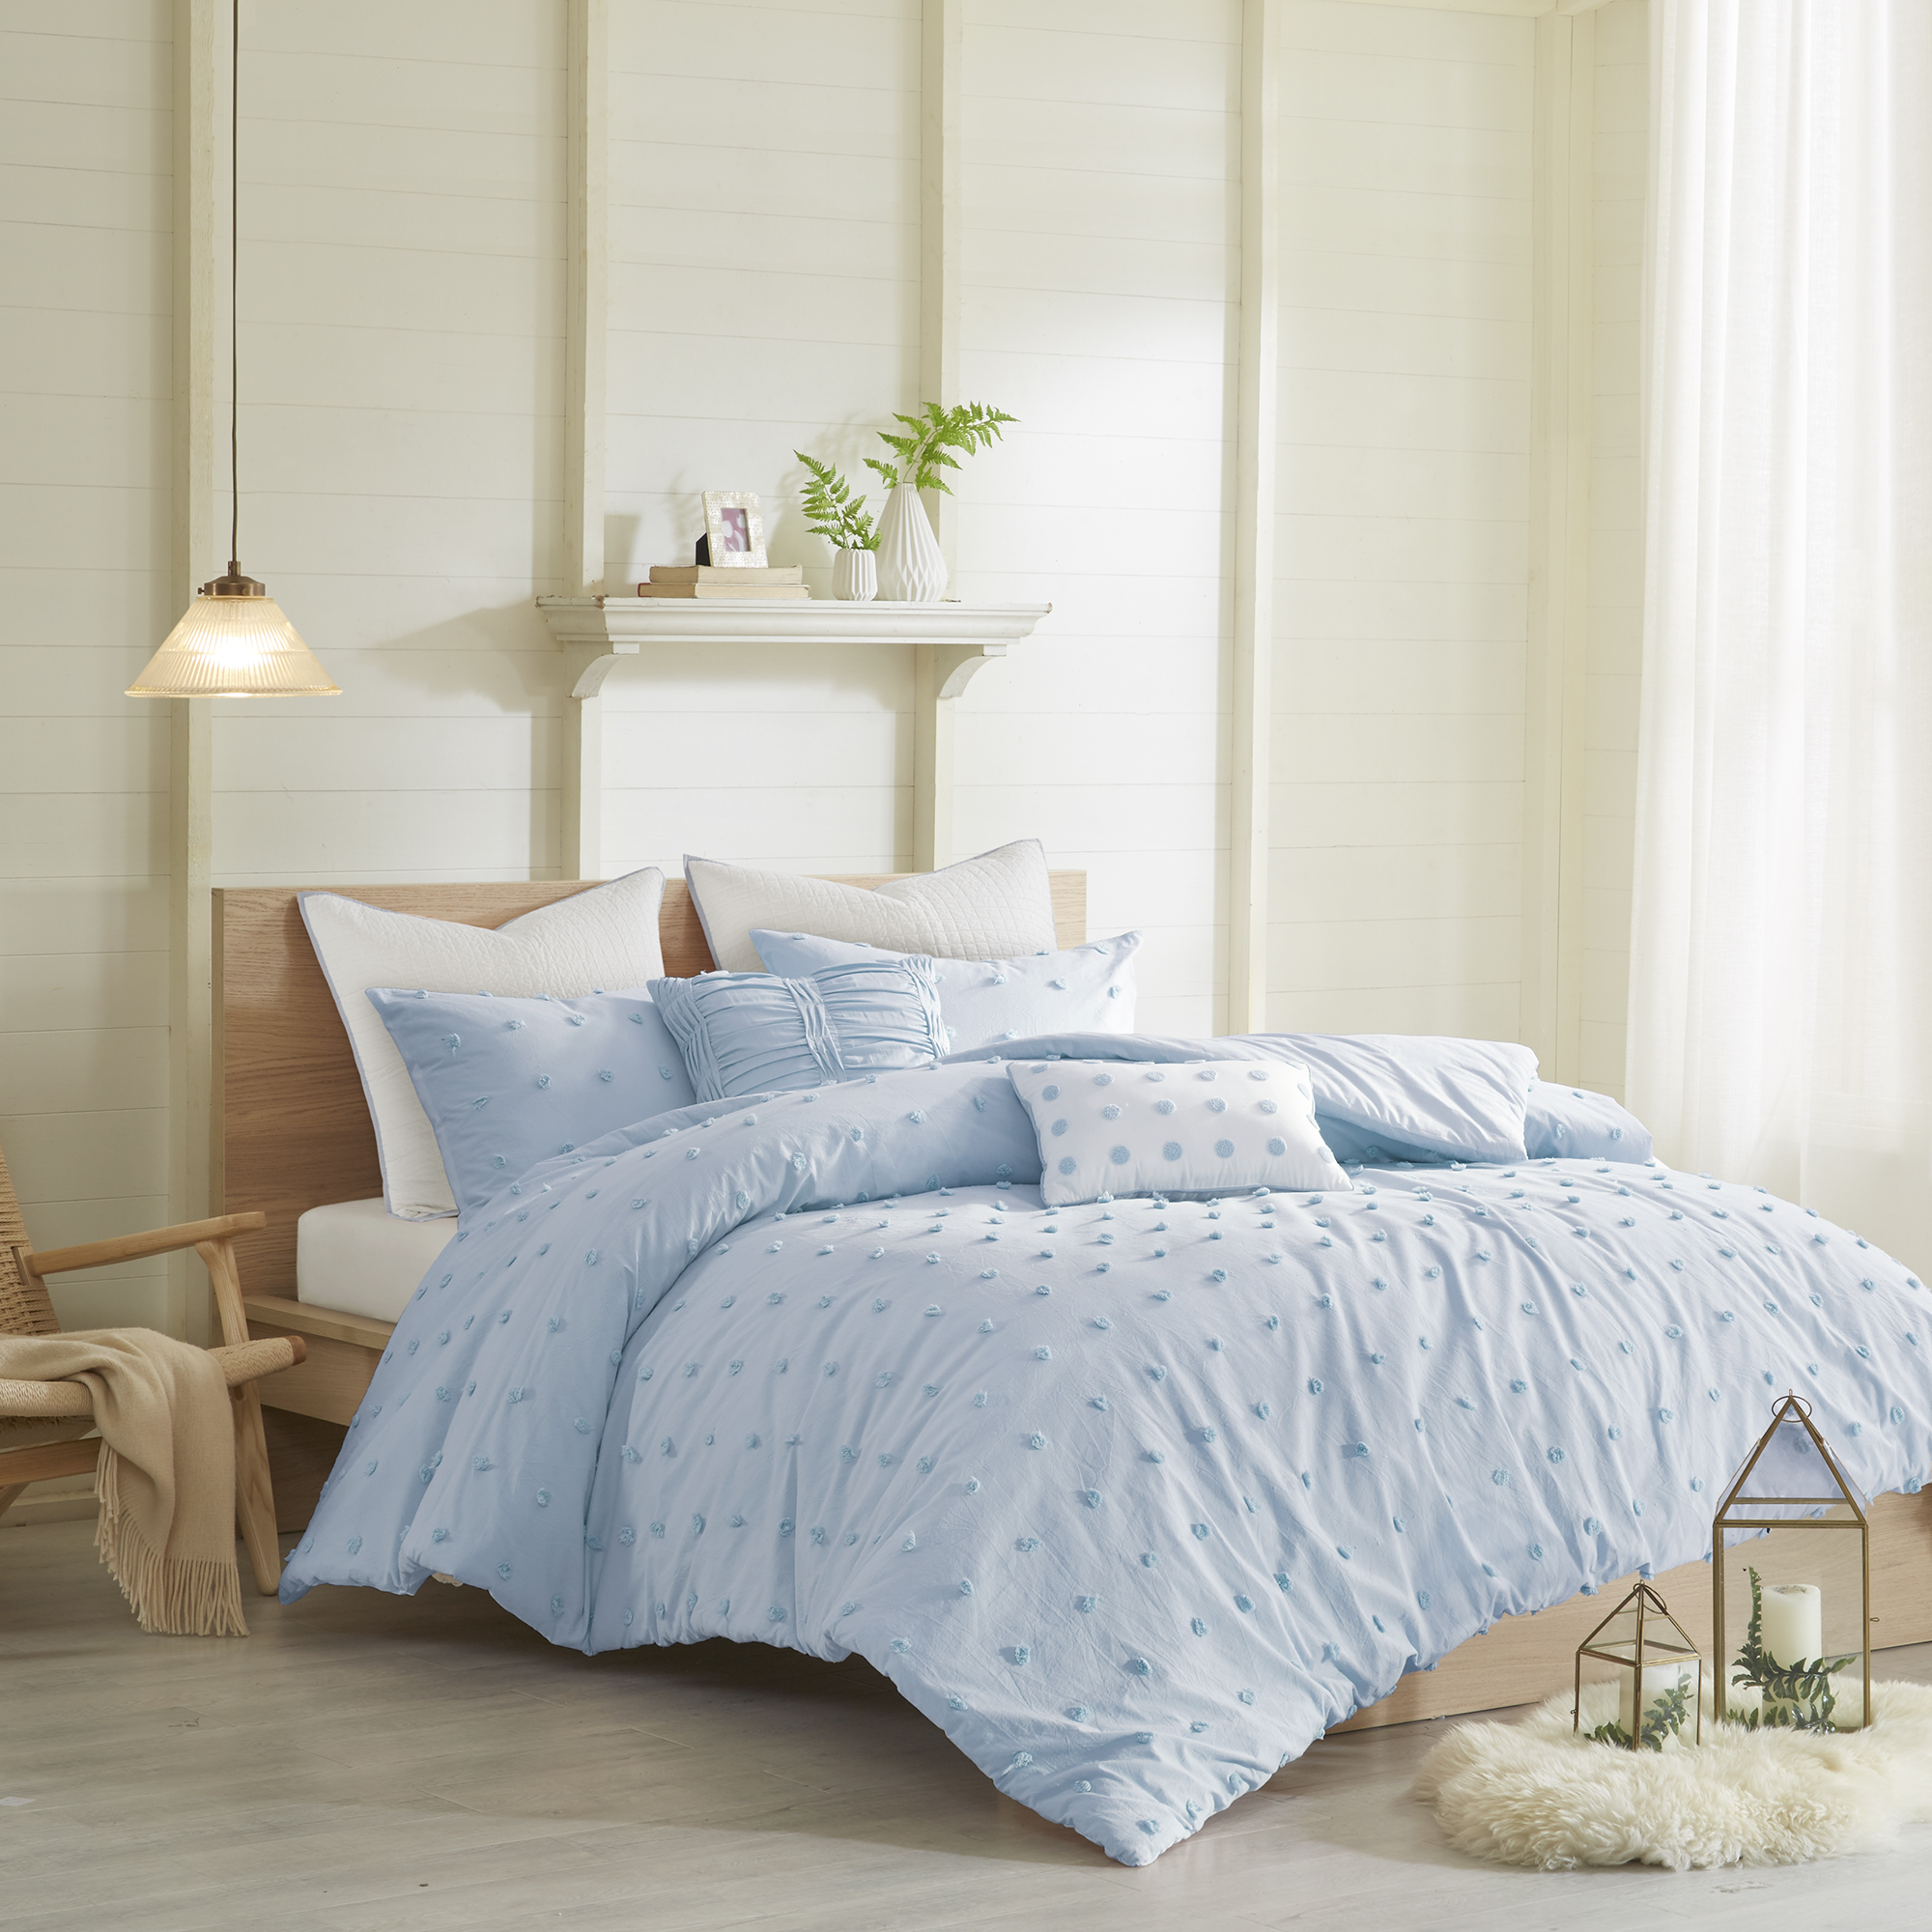 Home Essence Apartment Kay Cotton Jacquard Duvet Cover Set, Full/Queen Ivory White